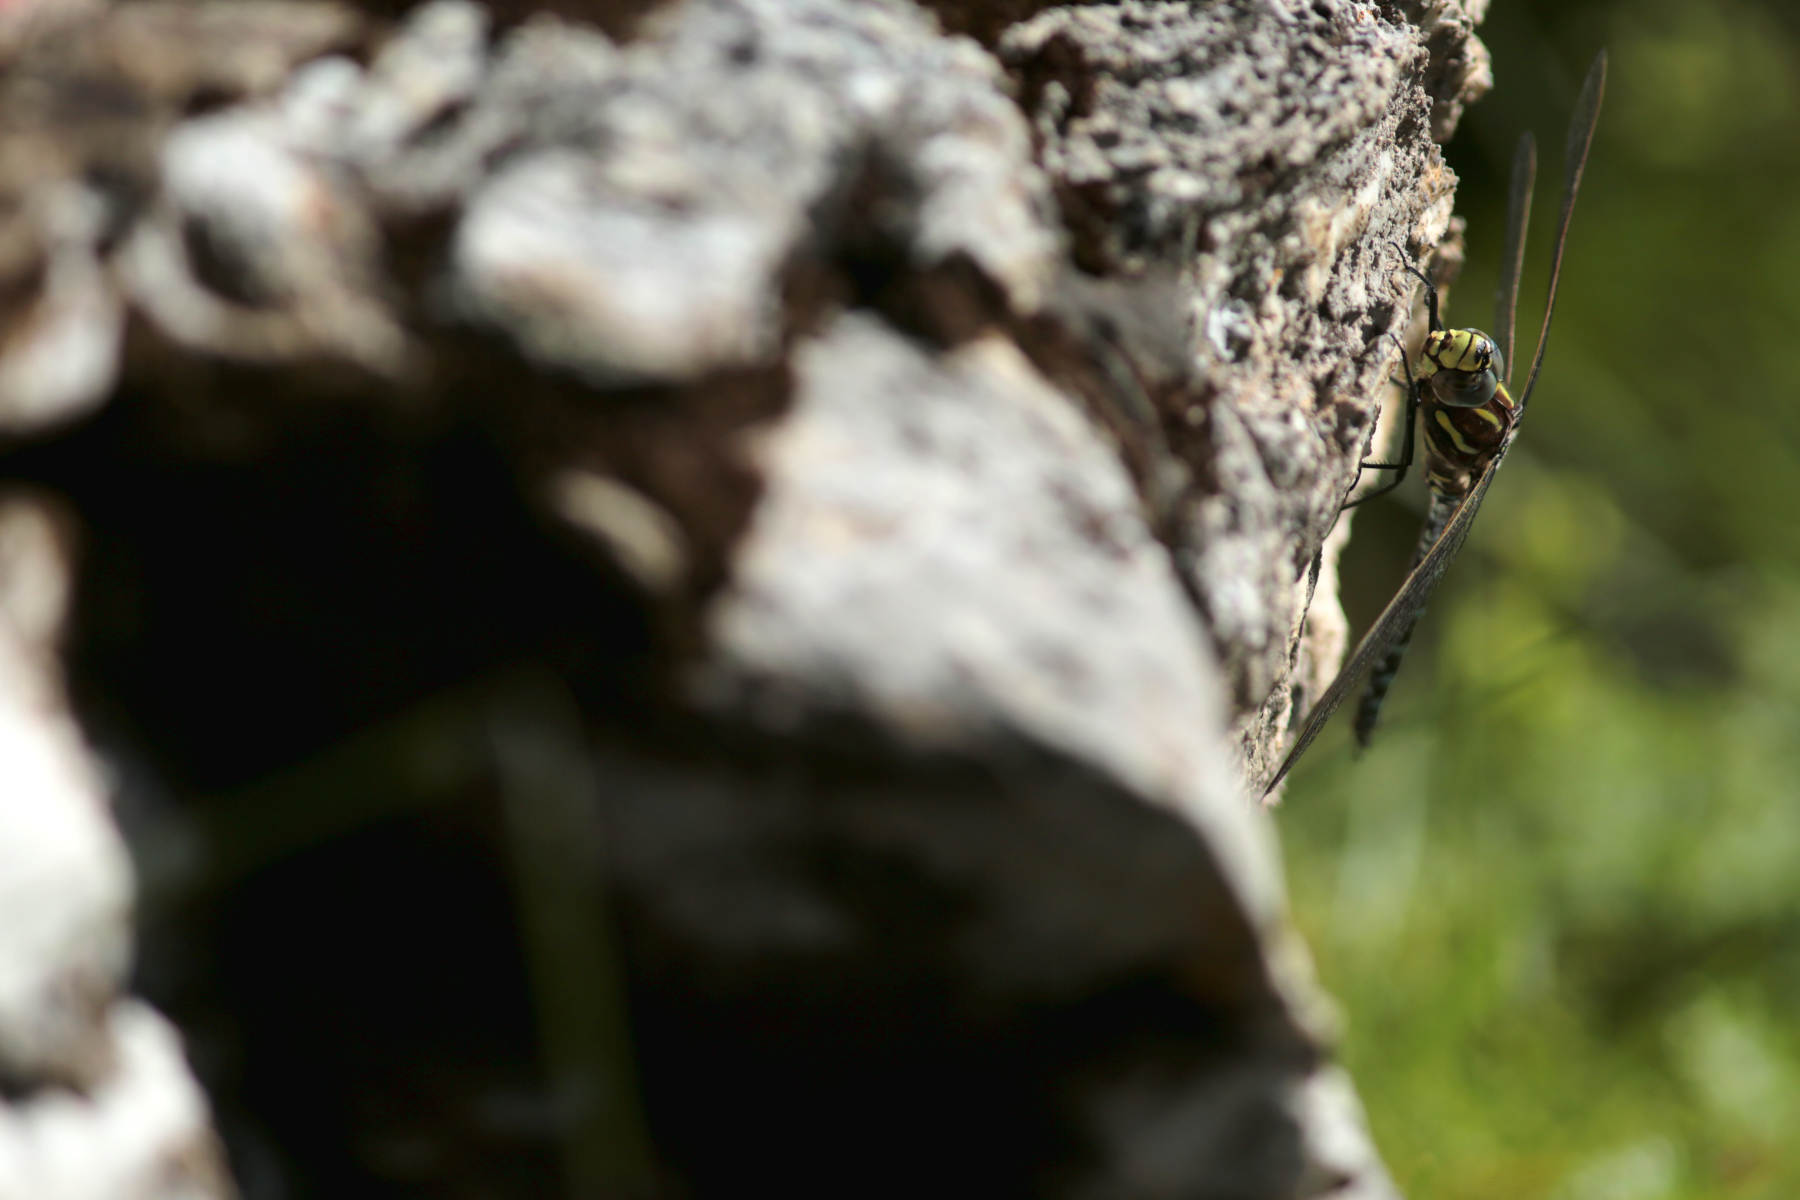 Aeschne des joncs - Aeshna juncea - Common hawker